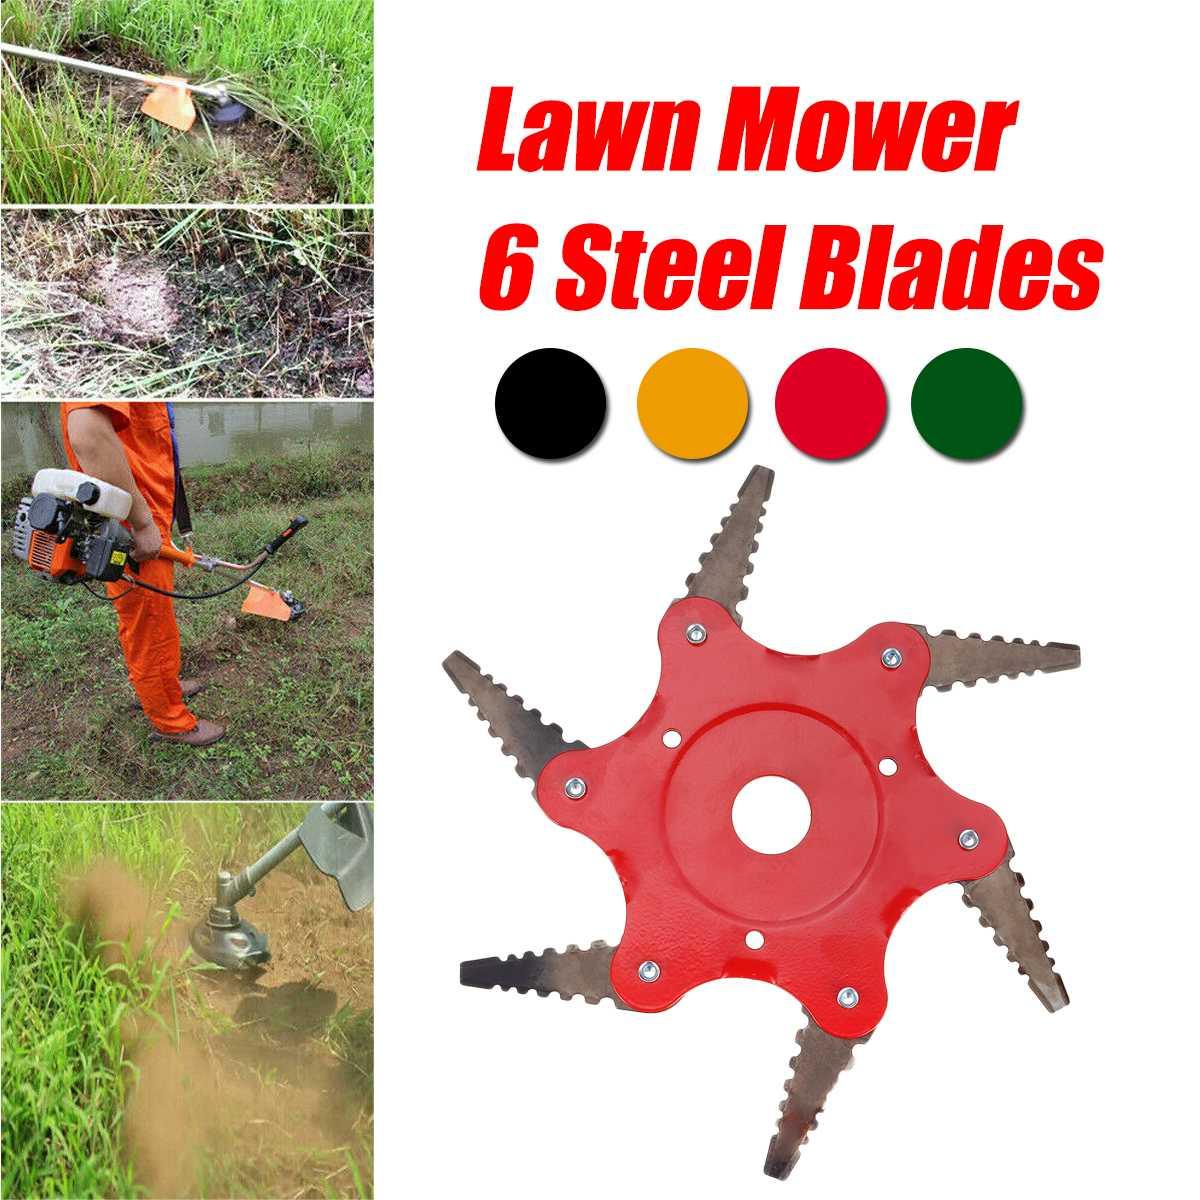 6 Tooth Garden Lawn Mower Blade Manganese Steel Grass Trimmer Brush Cutter Head